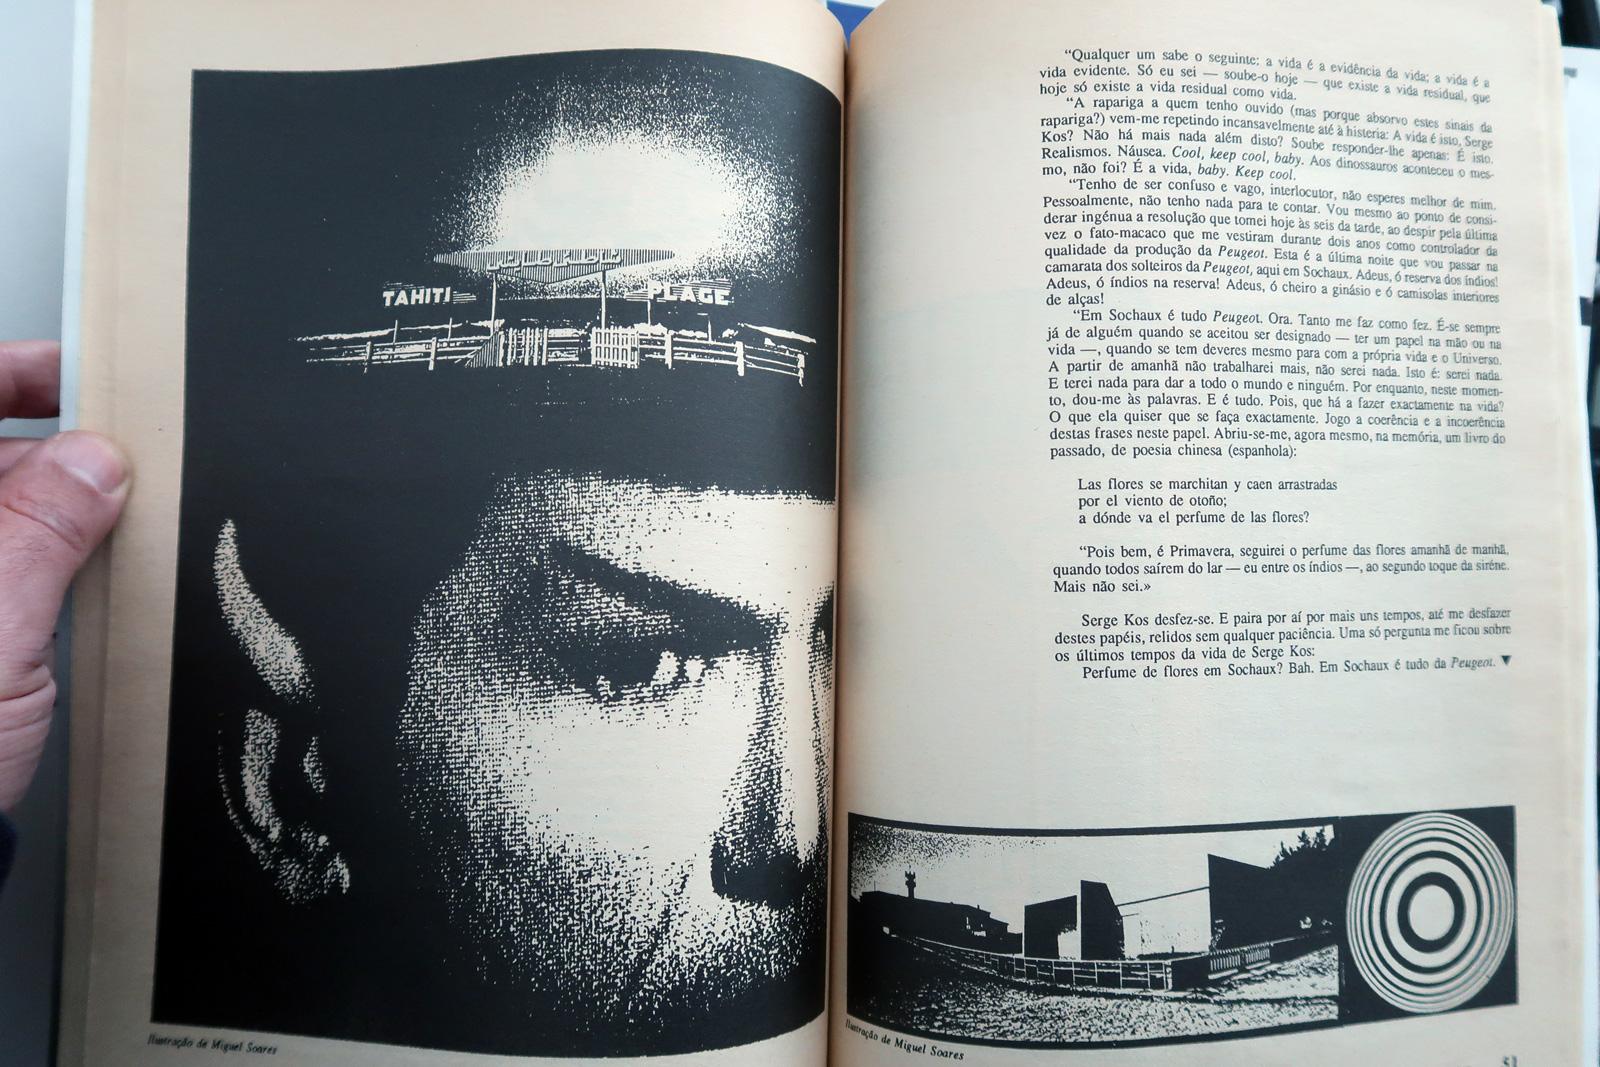 Carlos Leite,Revista Vertice n50, SetOut, 1992.